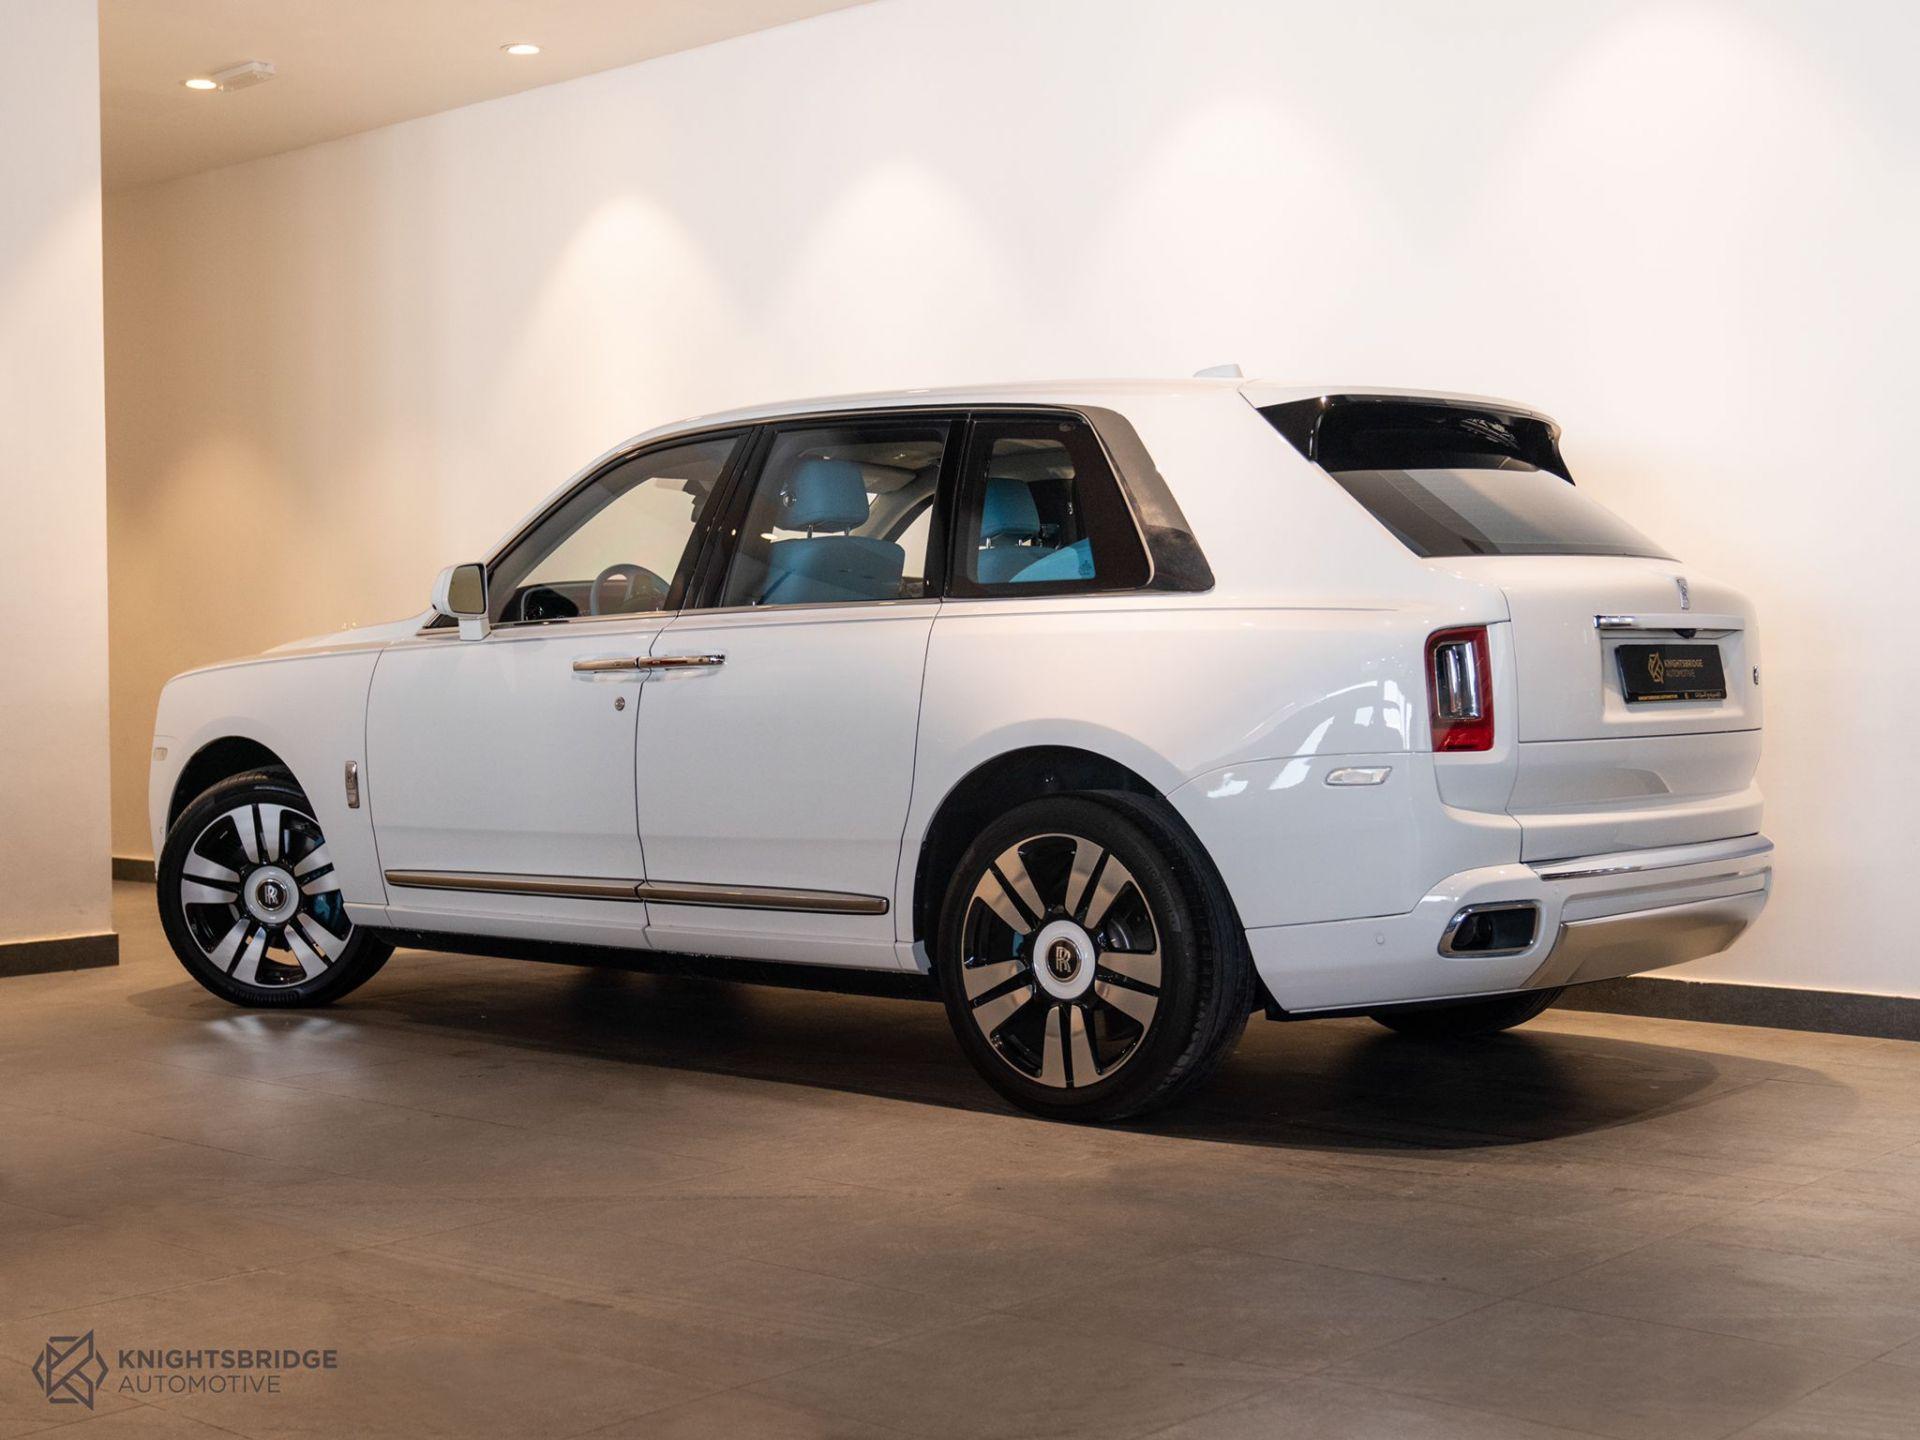 2021 Rolls-Royce Cullinan at Knightsbridge Automotive - (10061 - 4)